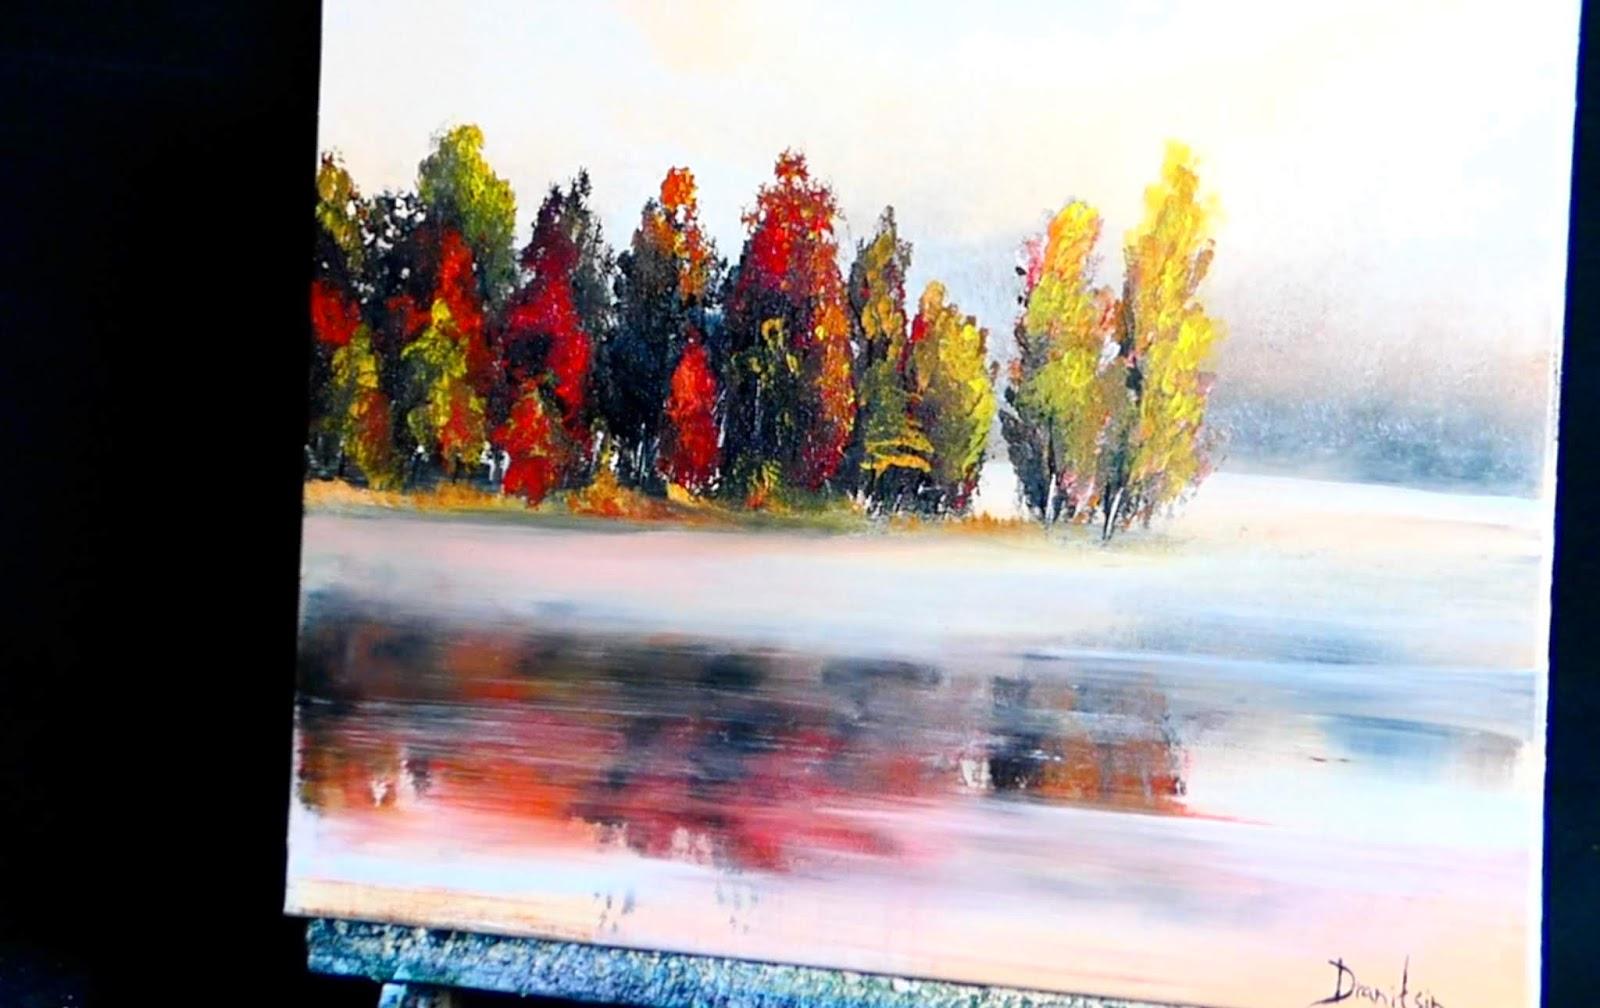 Red Pen Holder Paint Brush Fan Brushes Watercolor Oil Painting Art Supply